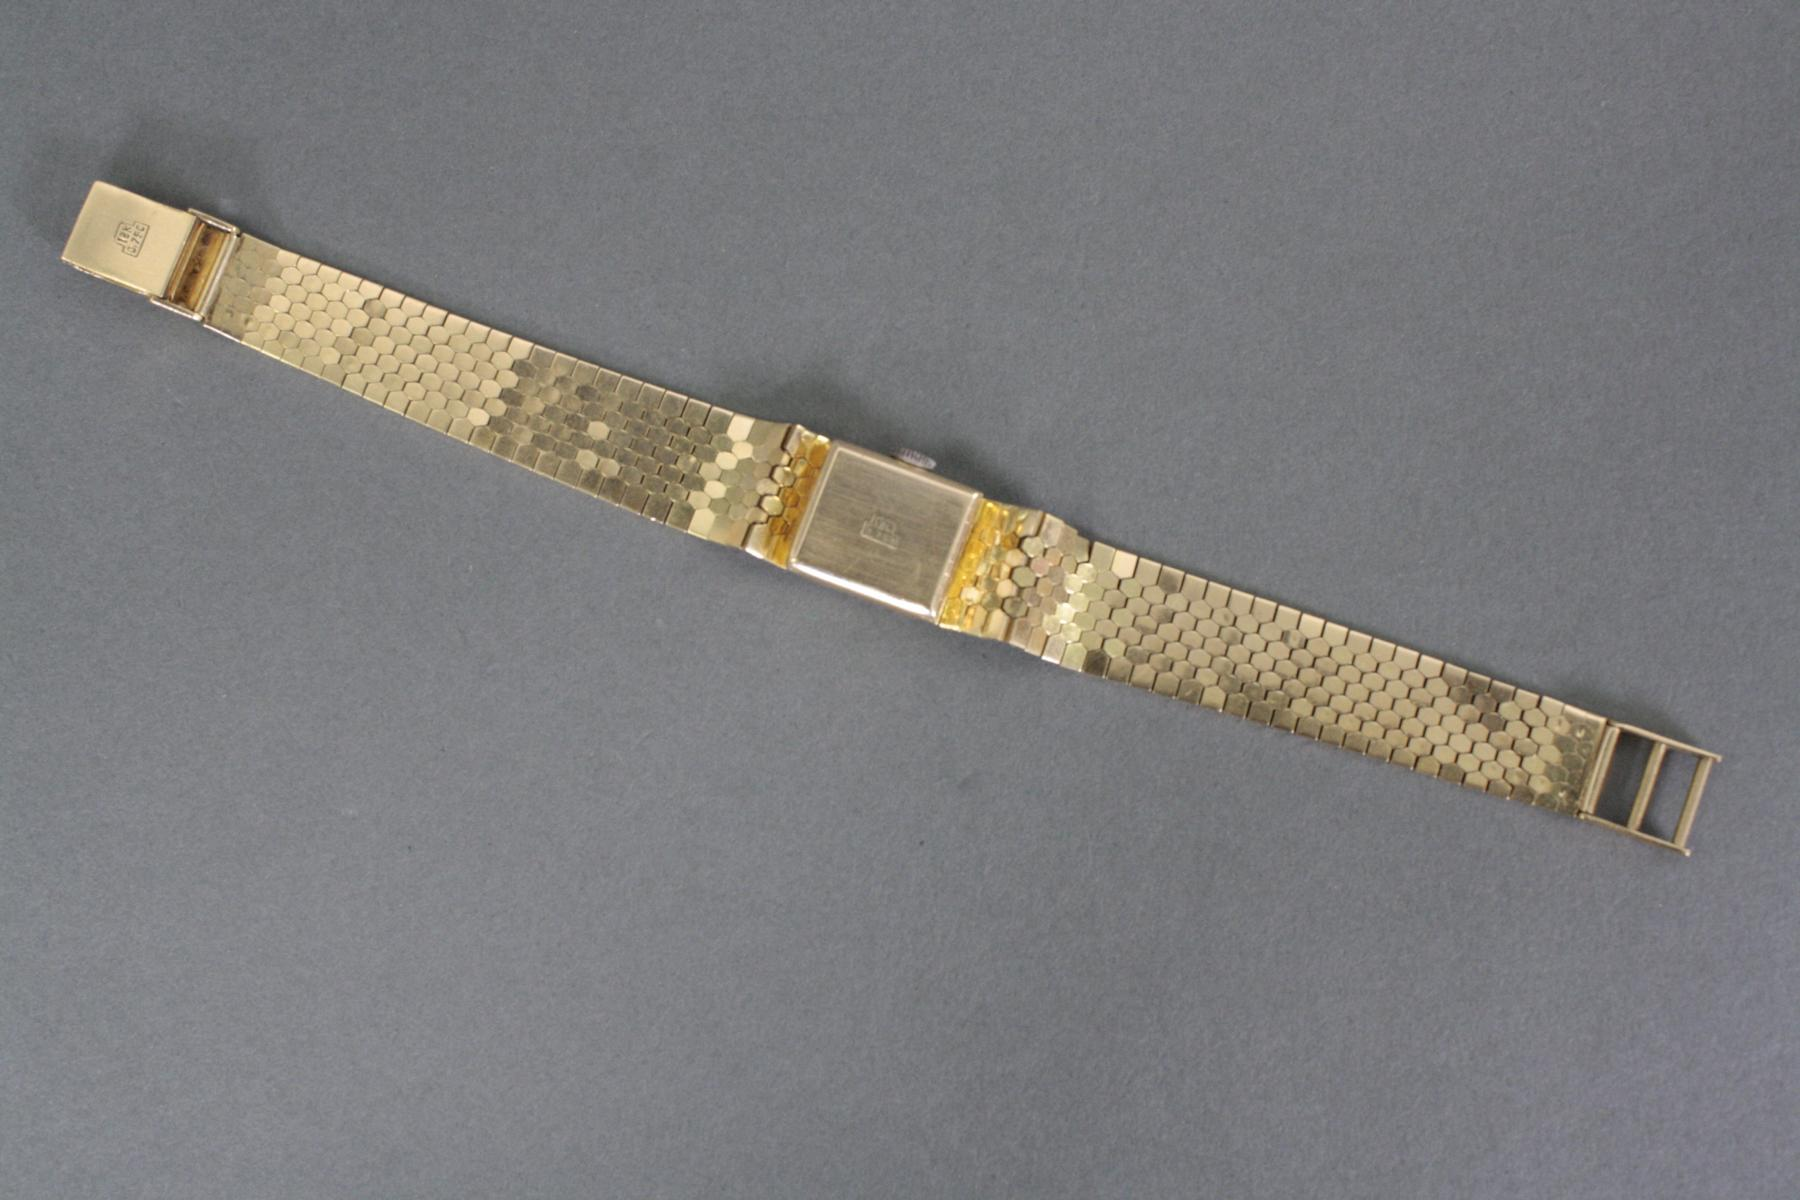 Damenarmbanduhr Roxy Anker, 18 Karat Gelbgold-3